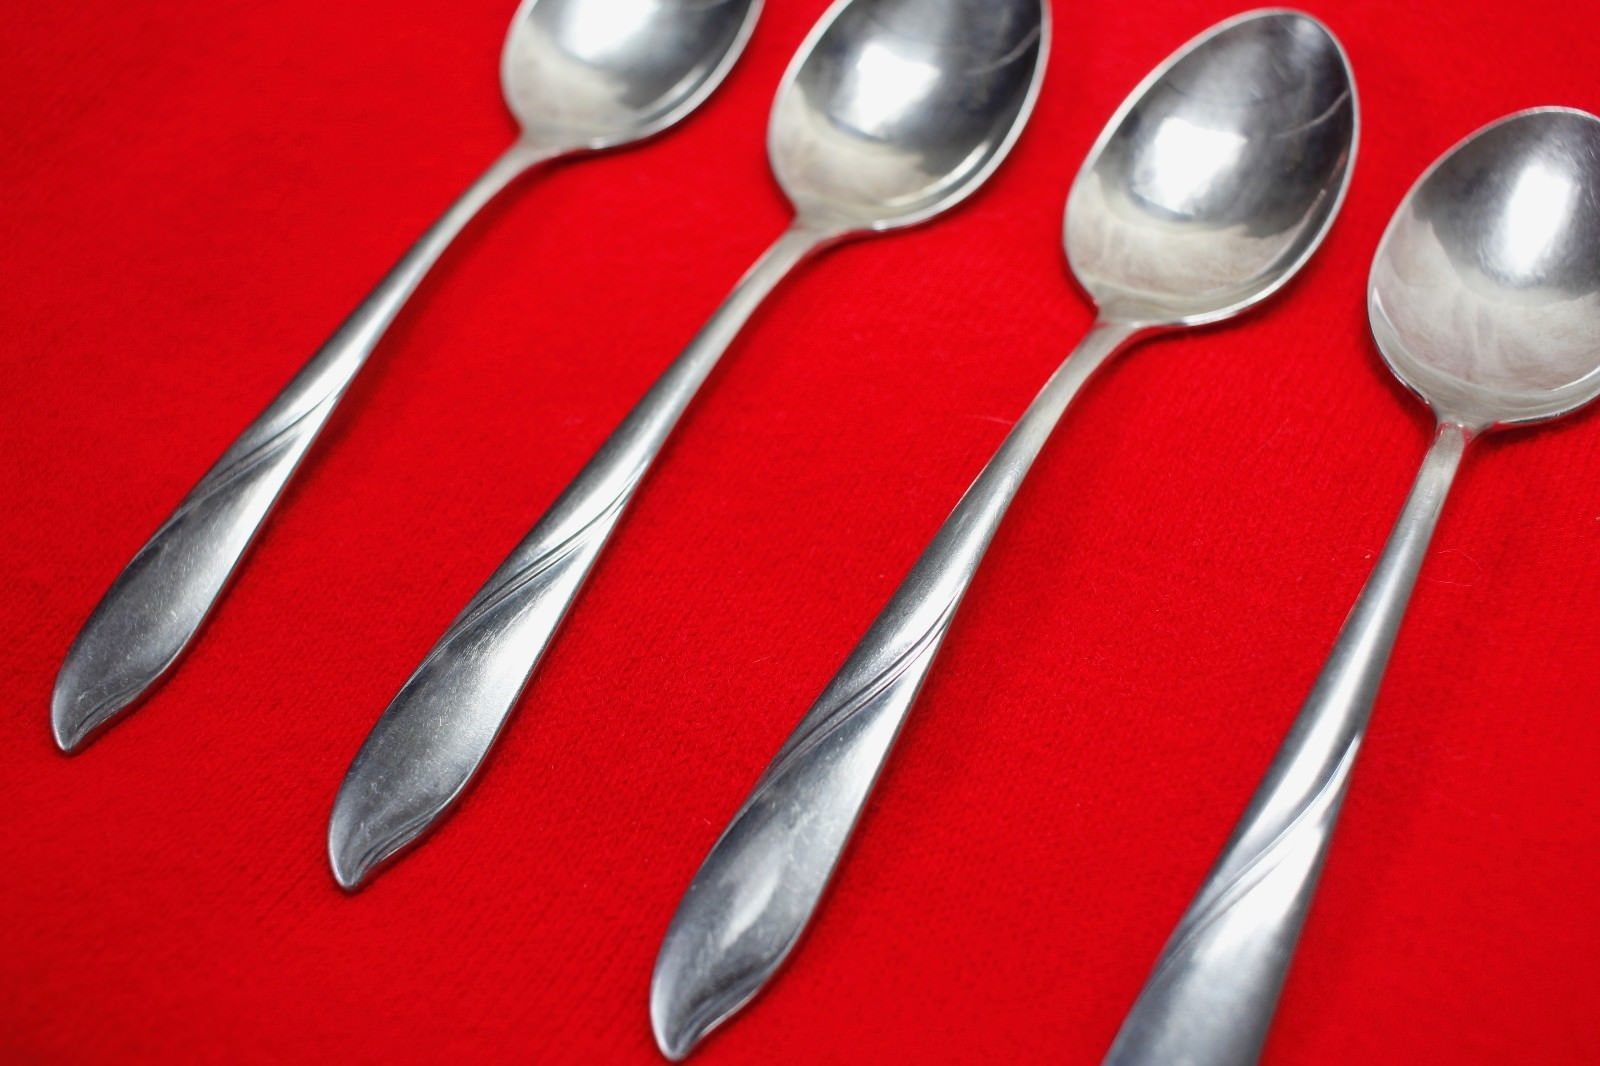 "4X Teaspoons Spoons Gorham Silver Lisa Stainless Glossy Flatware 6"" Tea Spoon"